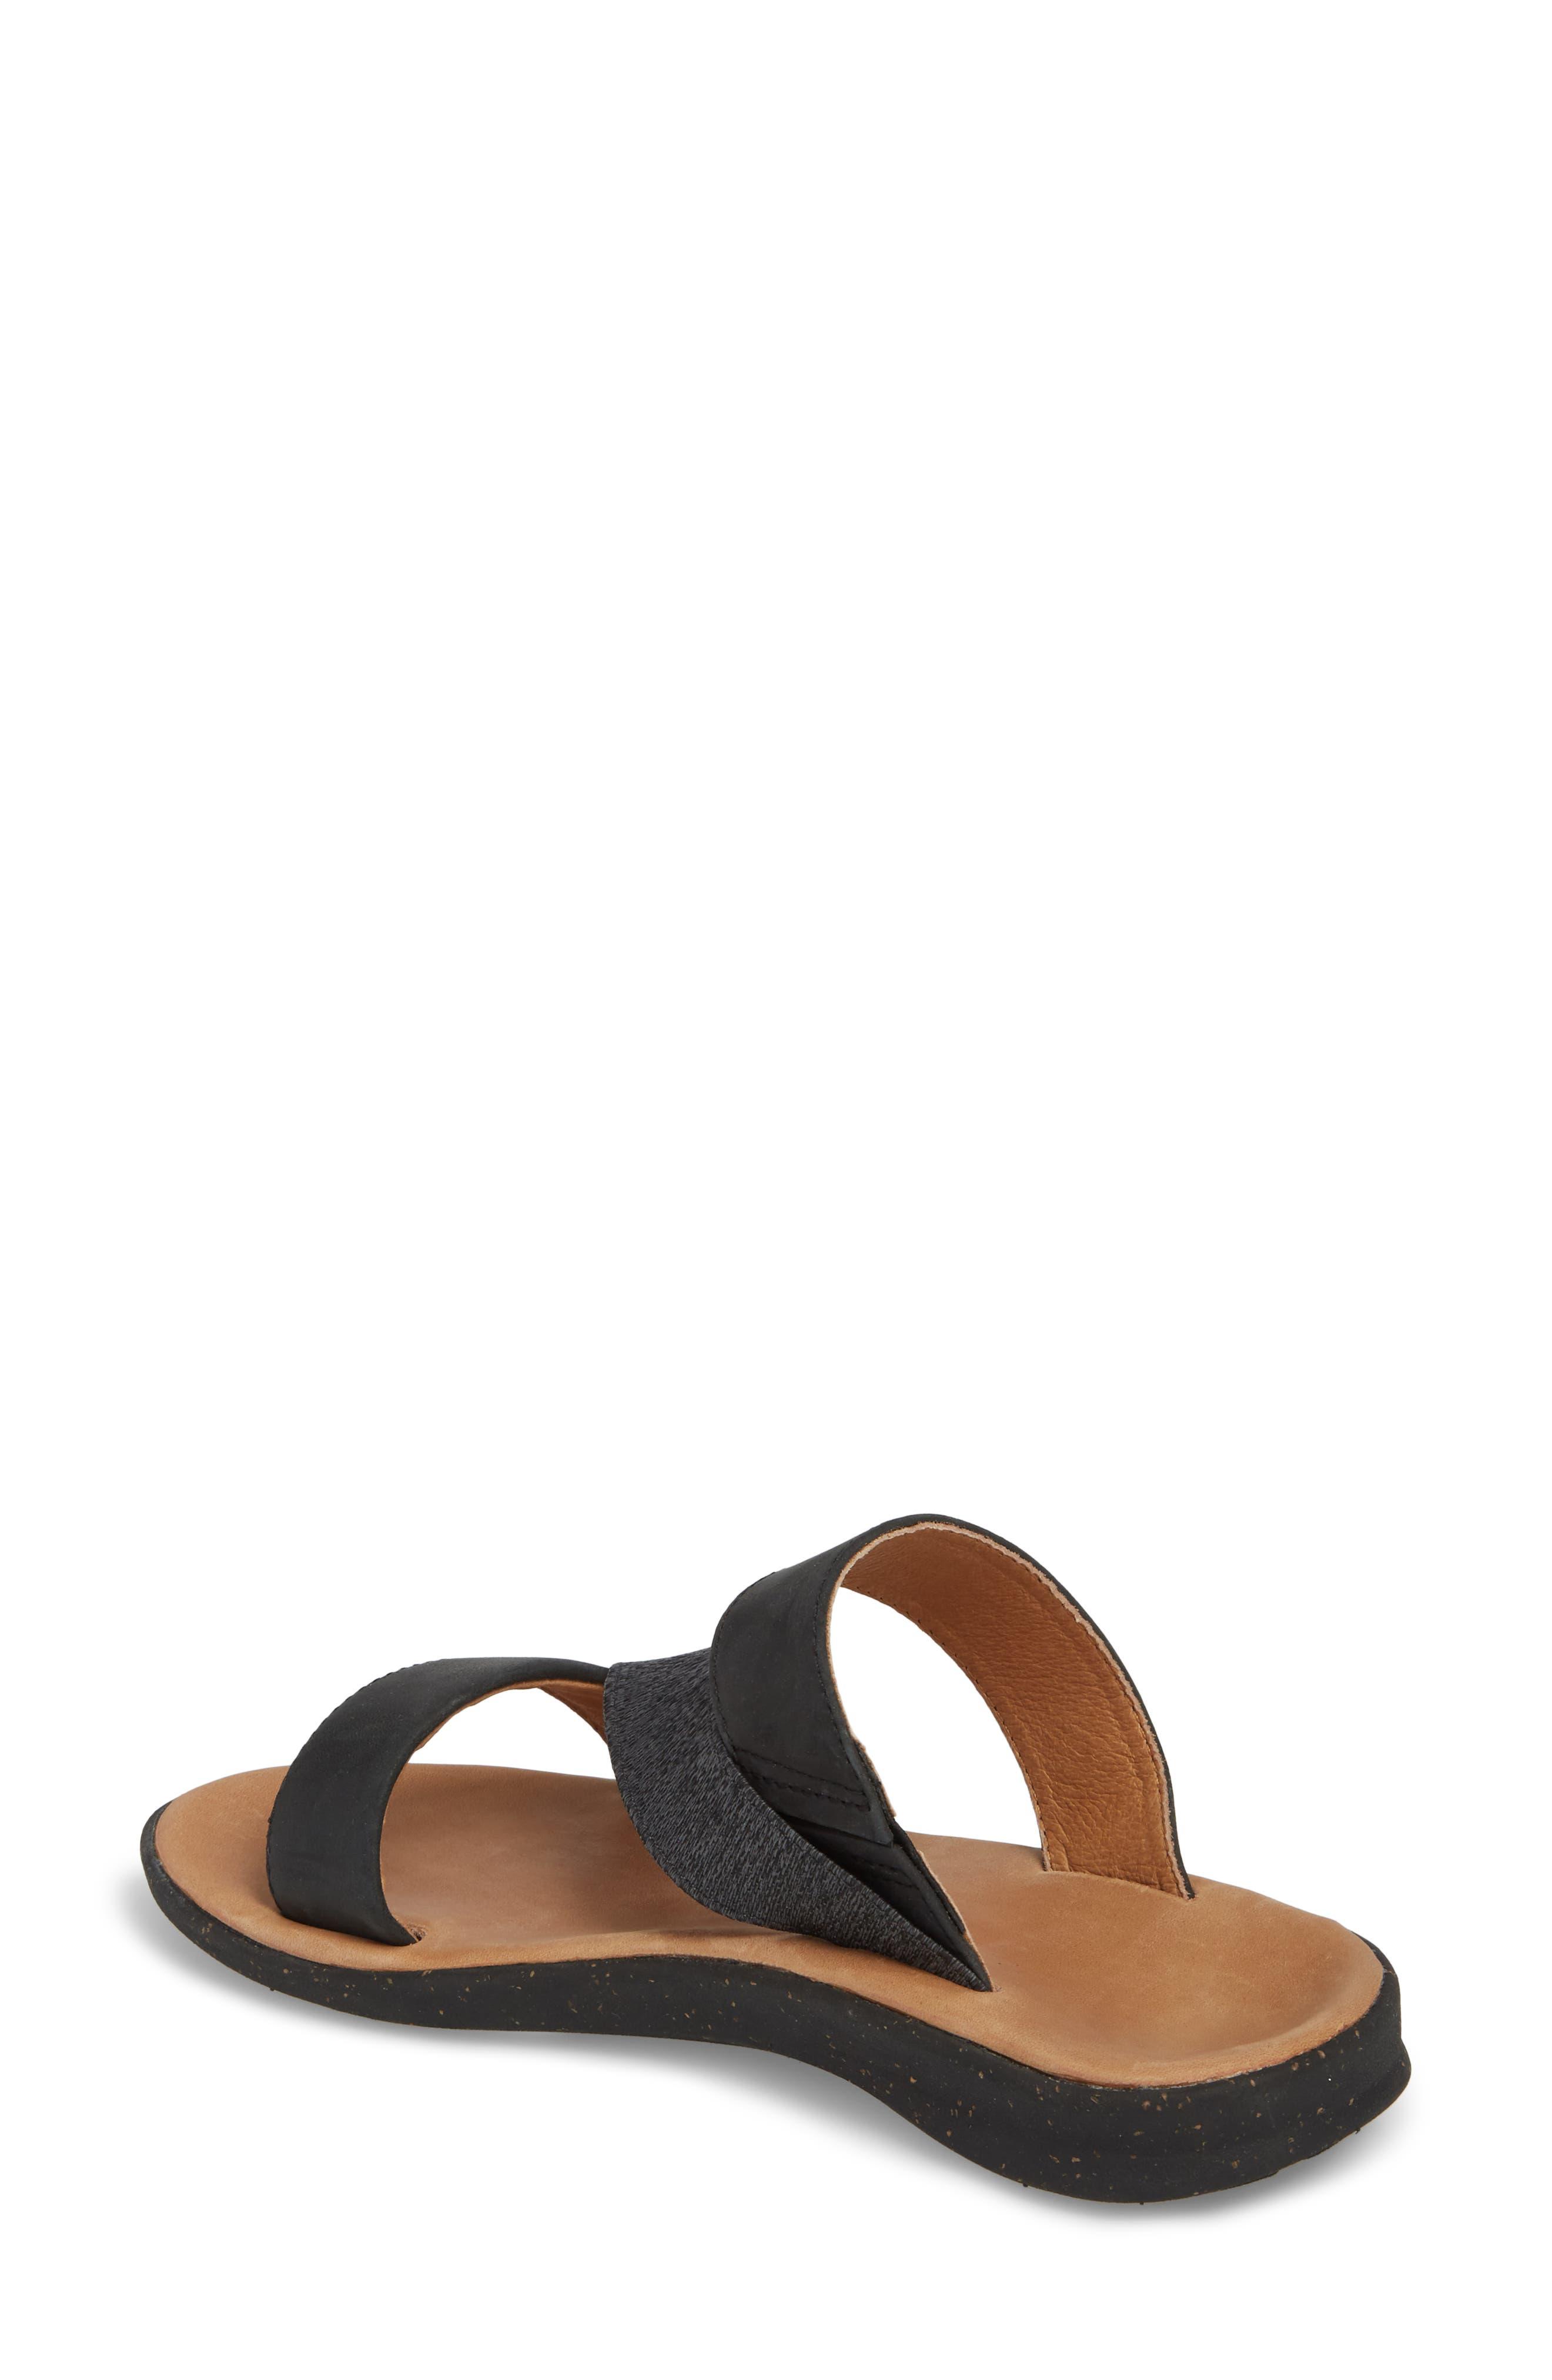 Reyes Slide Sandal,                             Alternate thumbnail 2, color,                             Black Leather